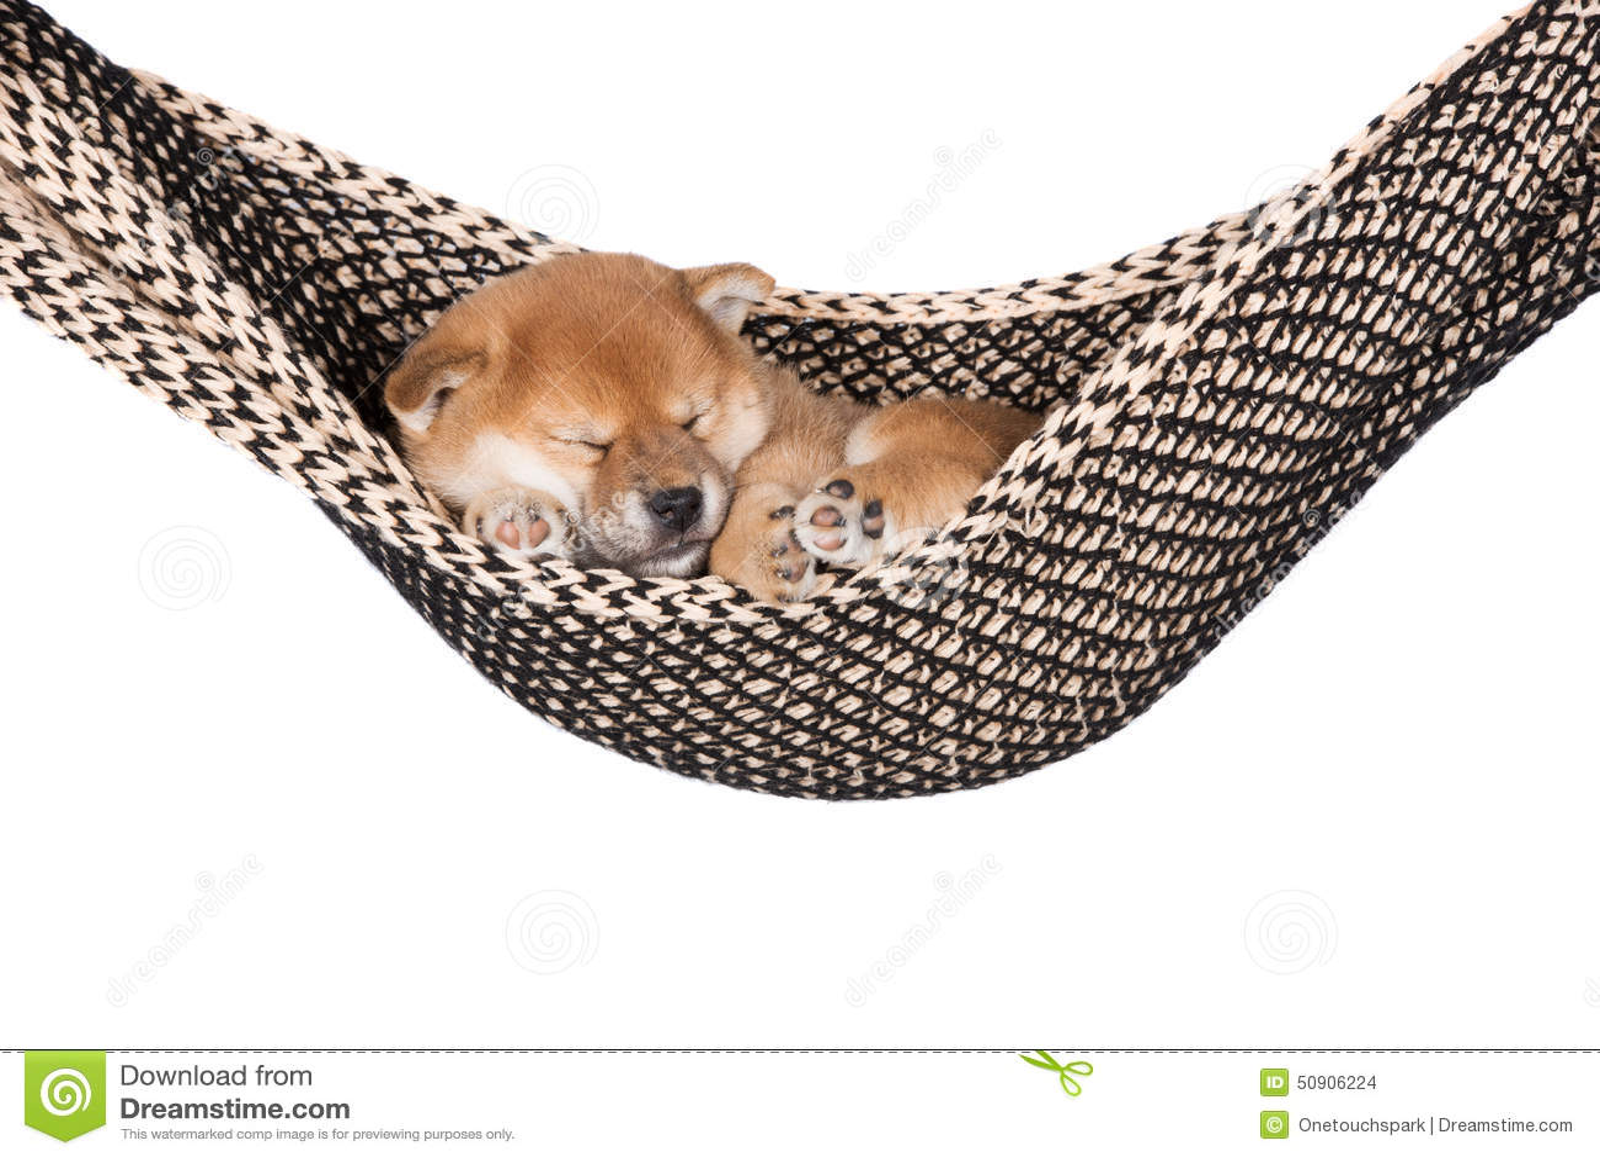 Shiba Inu Puppy Sleeping In A Hammock Stock Photo